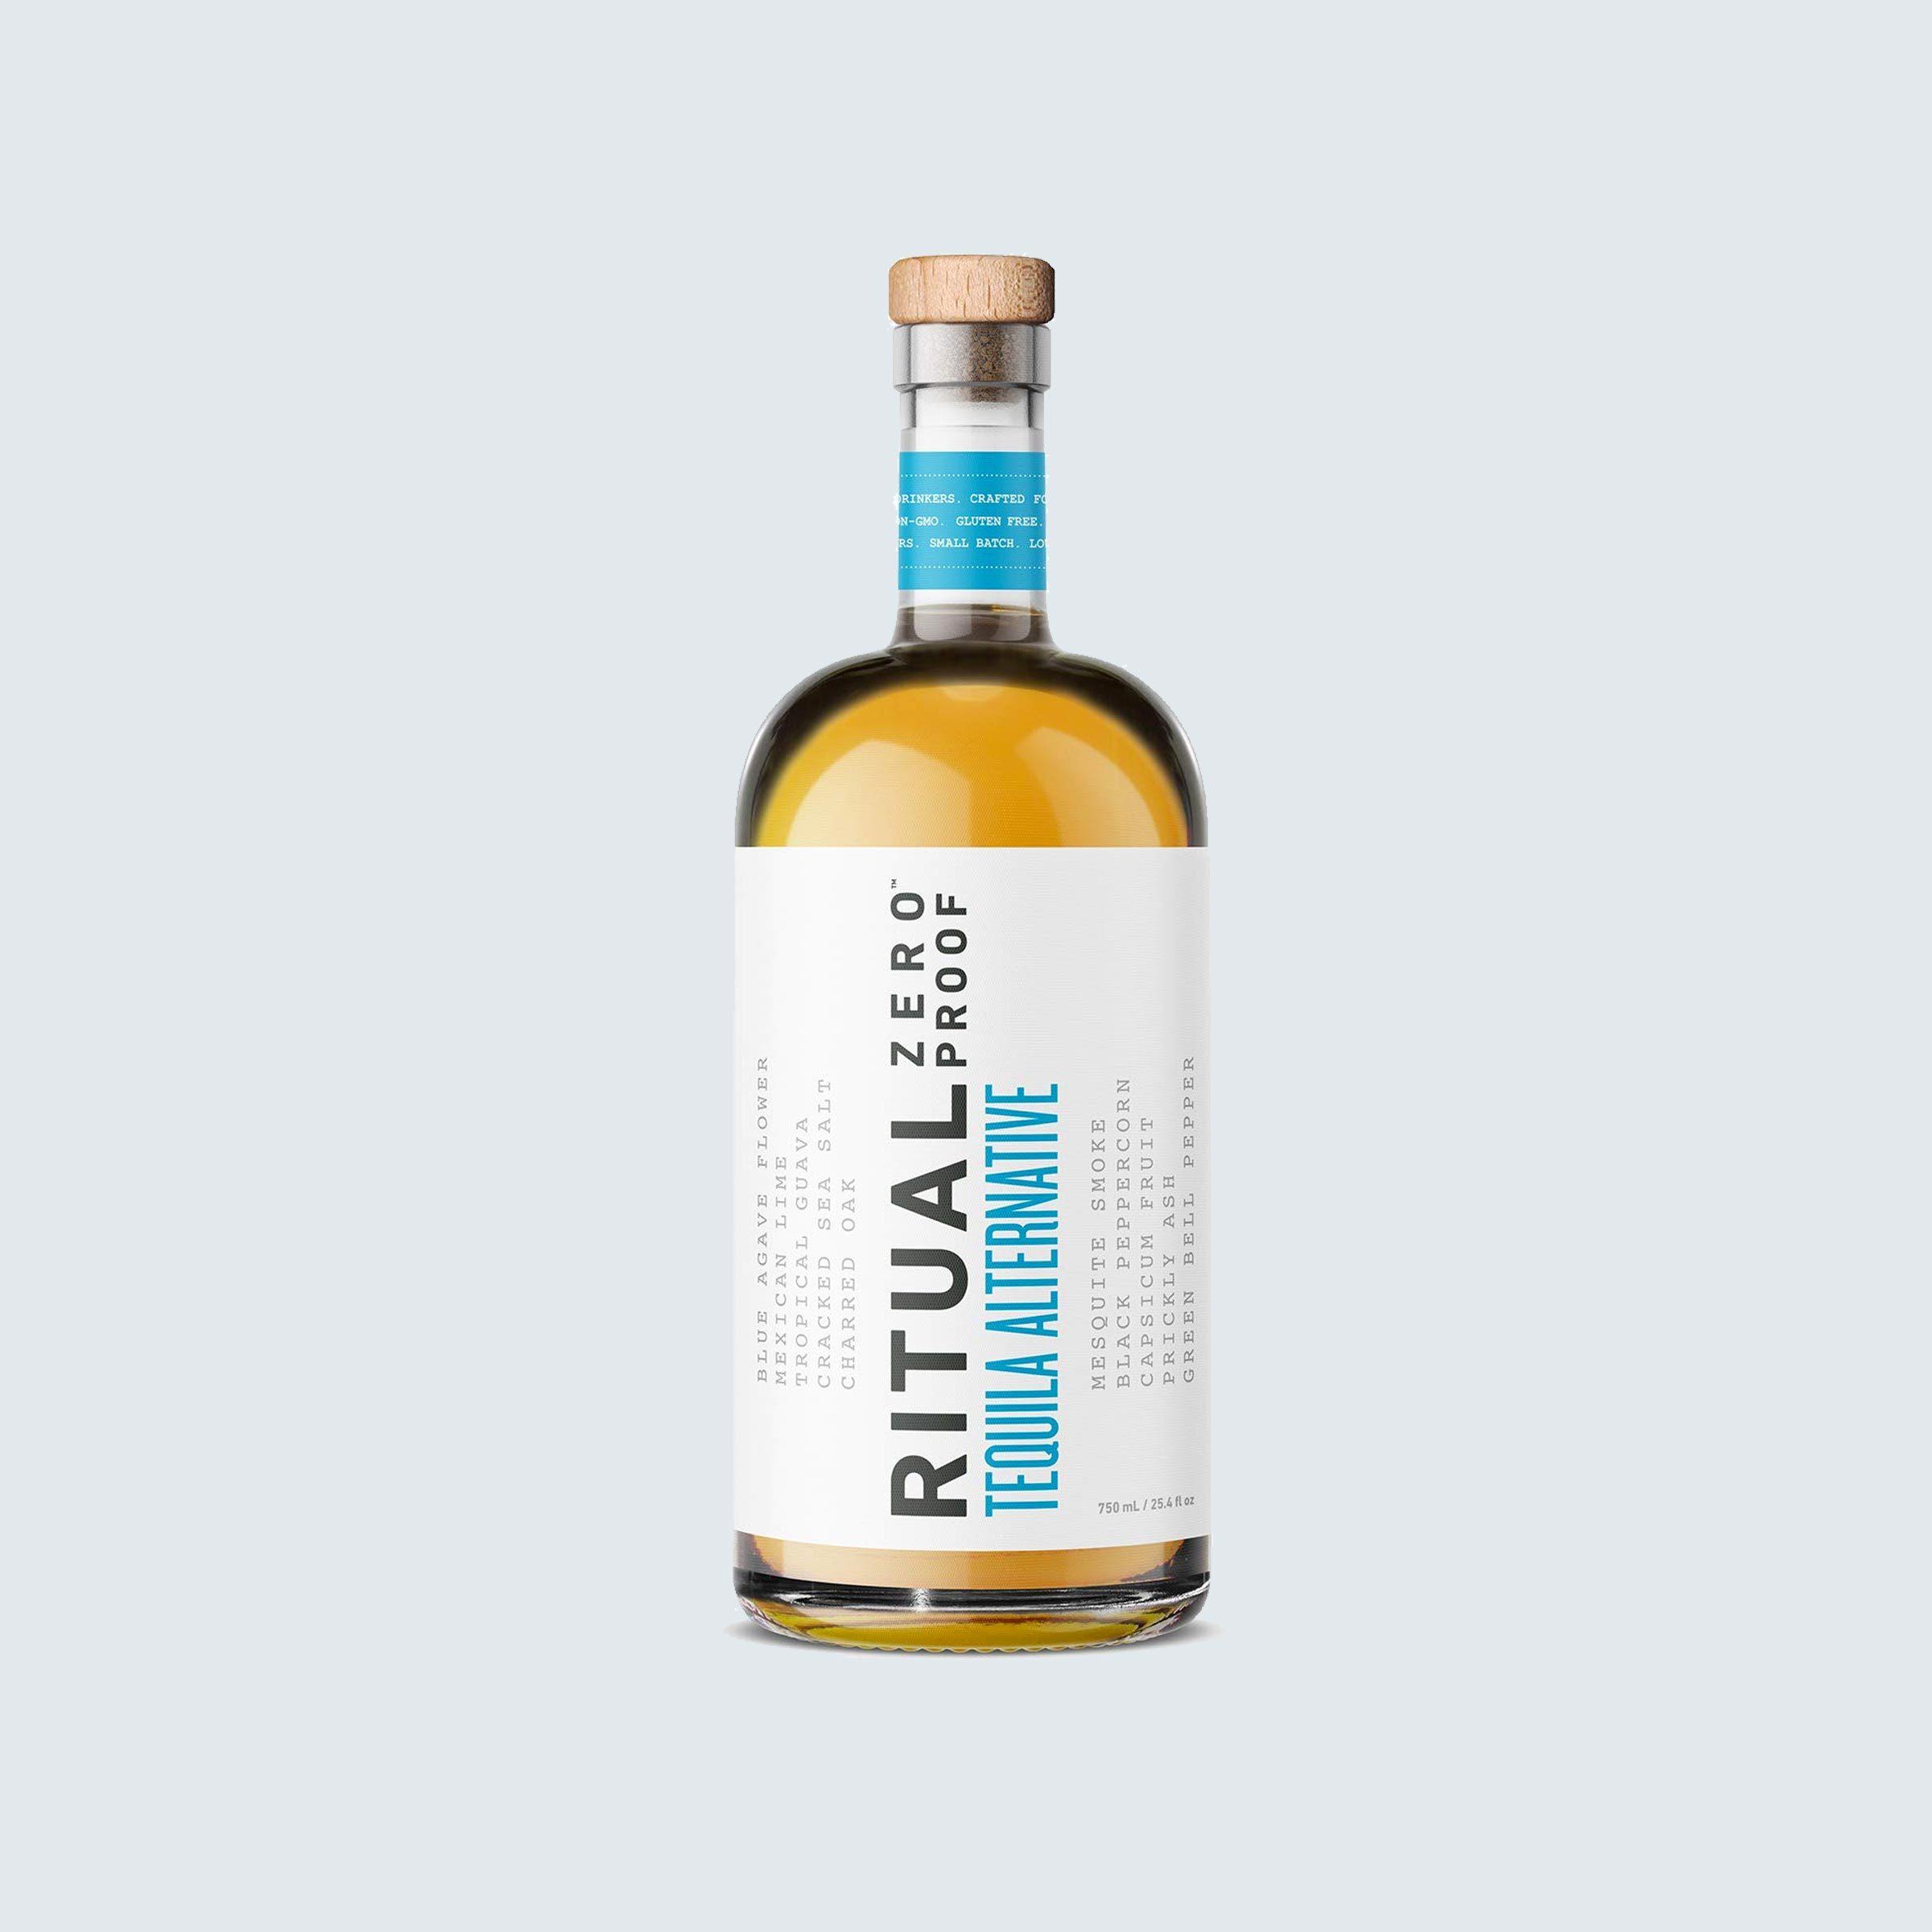 Ritual Zero Proof - Tequila alternative